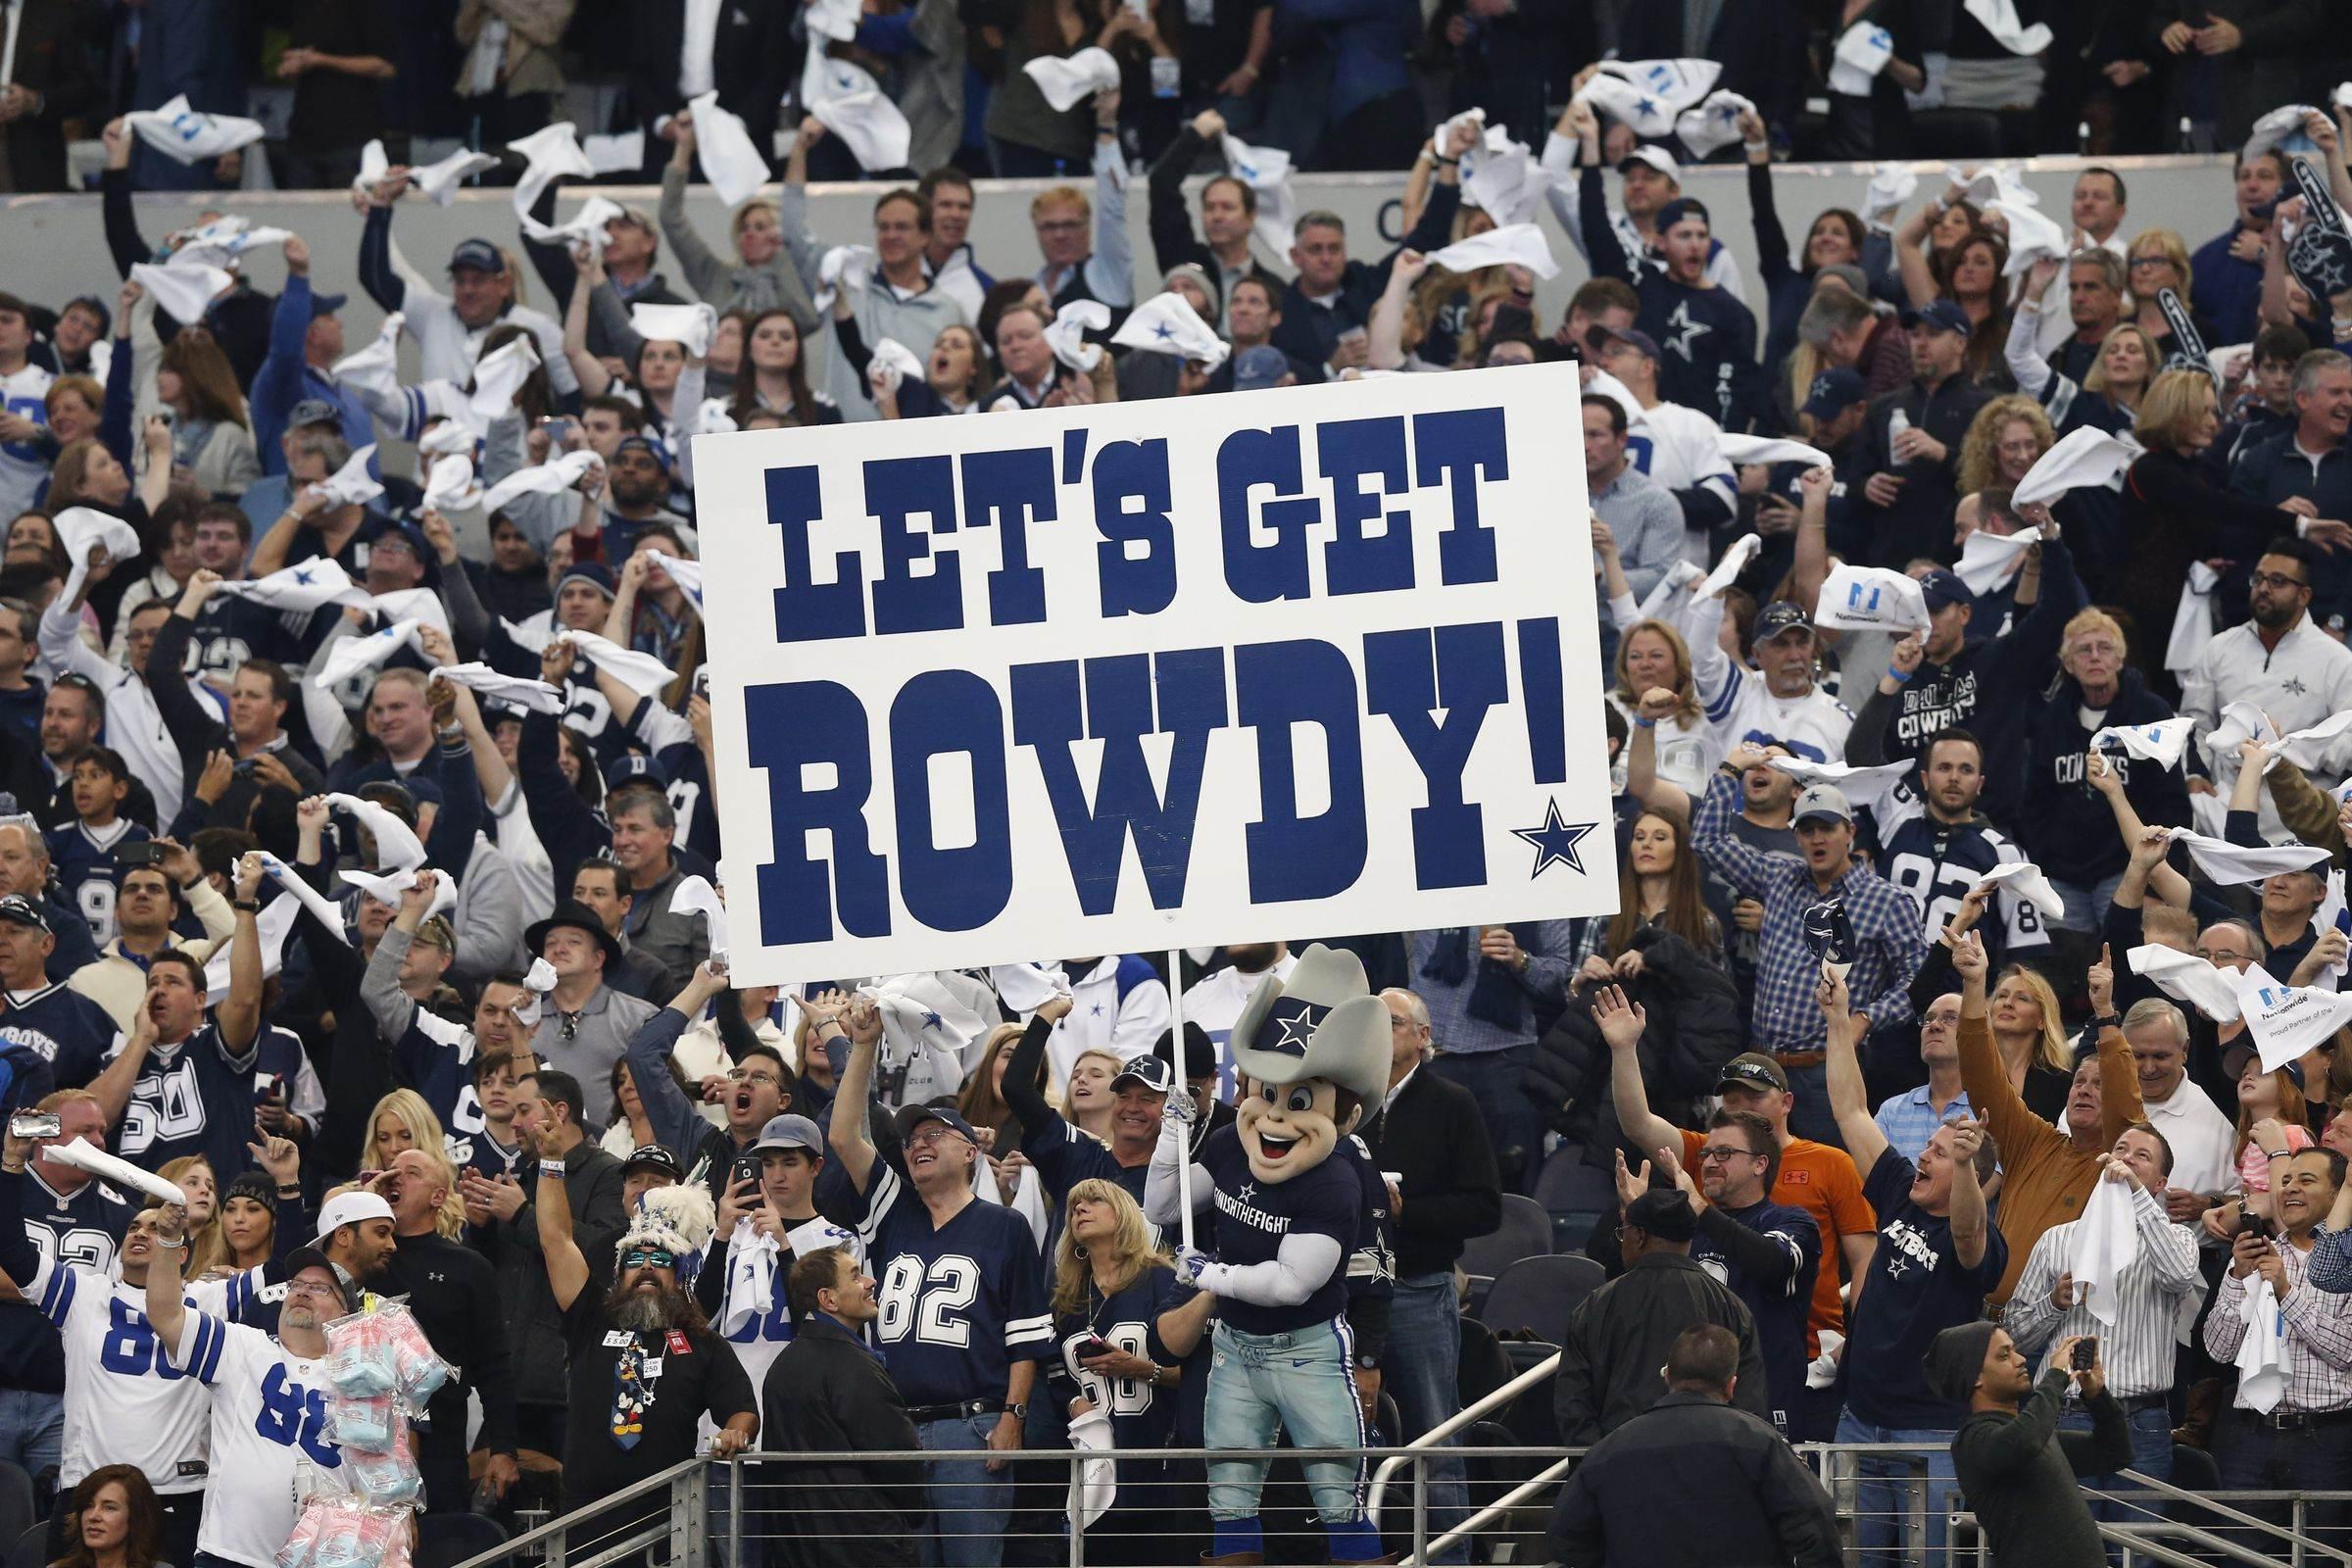 Cowboys Blog - Dallas Cowboys Vs. Washington Redskins: 5 Bold Predictions 6